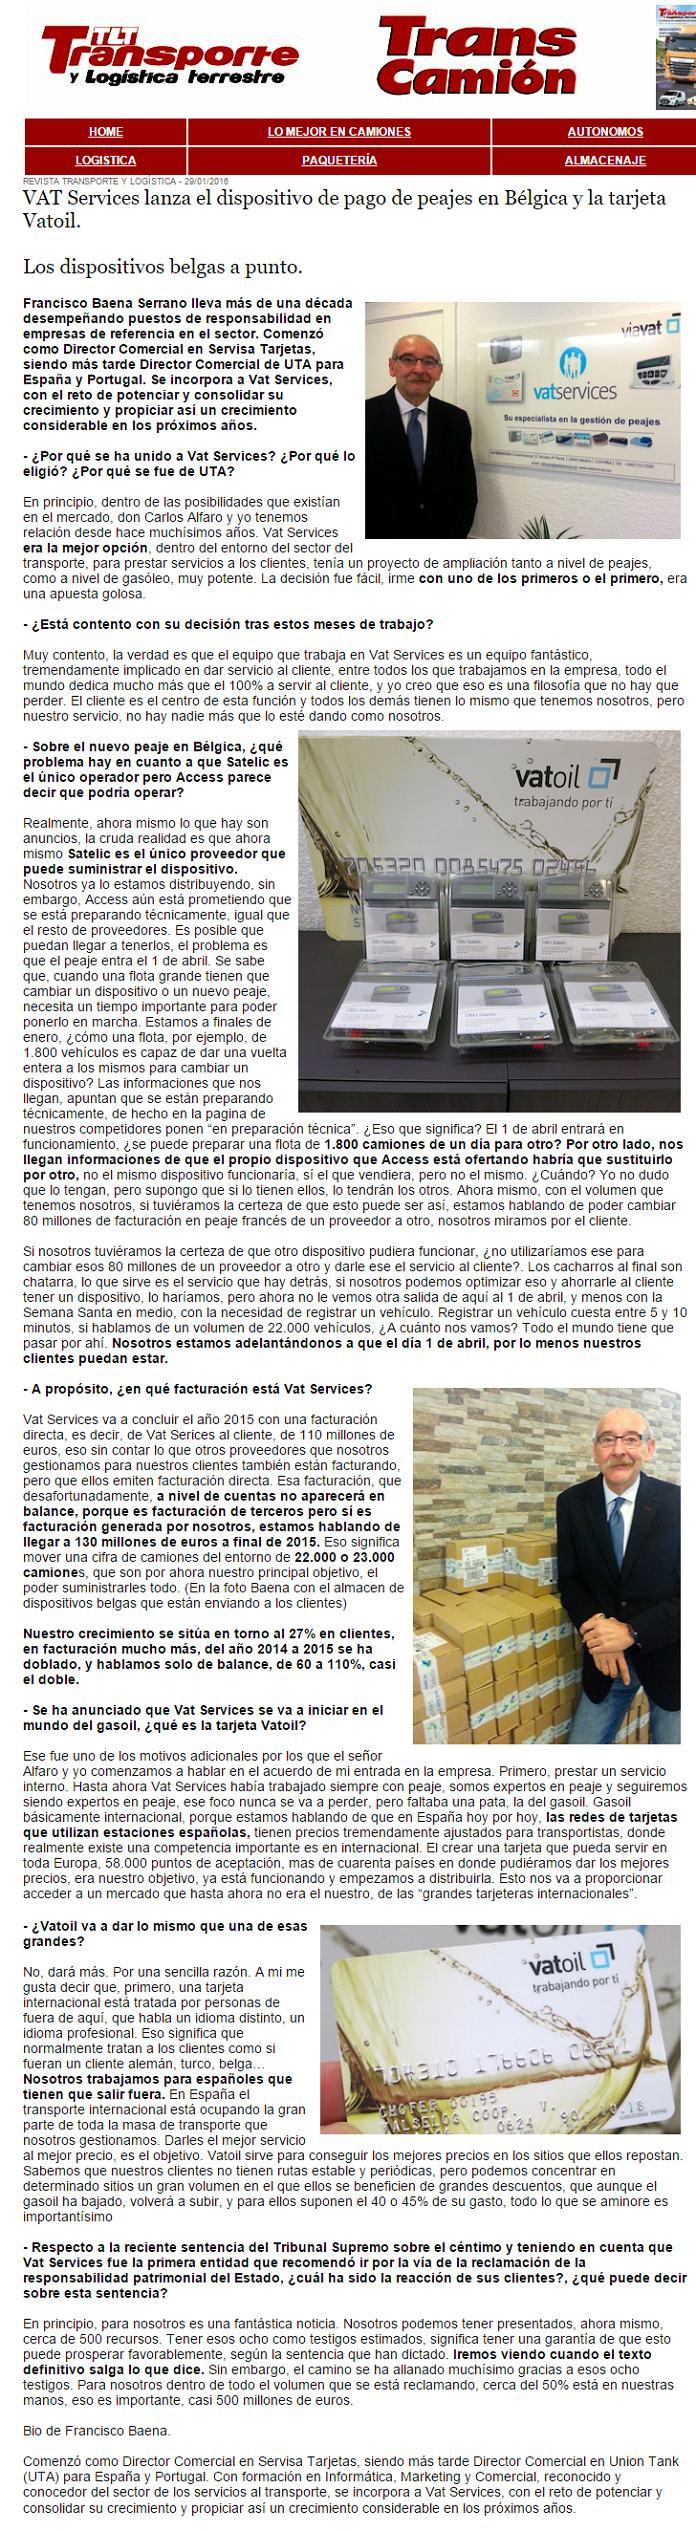 entrevista francisco baena de vatservices en transcamion